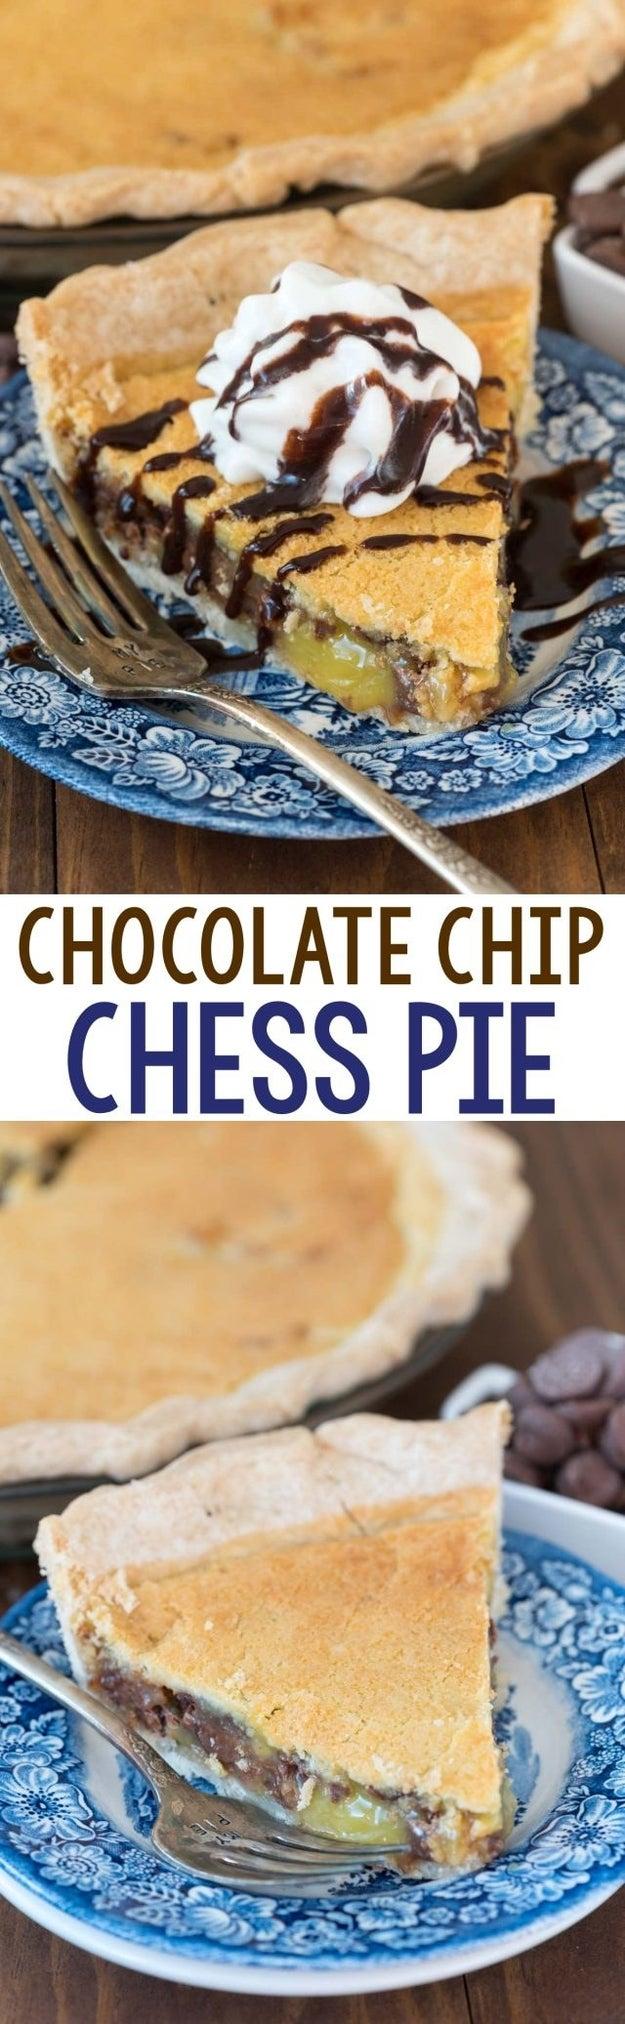 Chocolate Chip Chess Pie